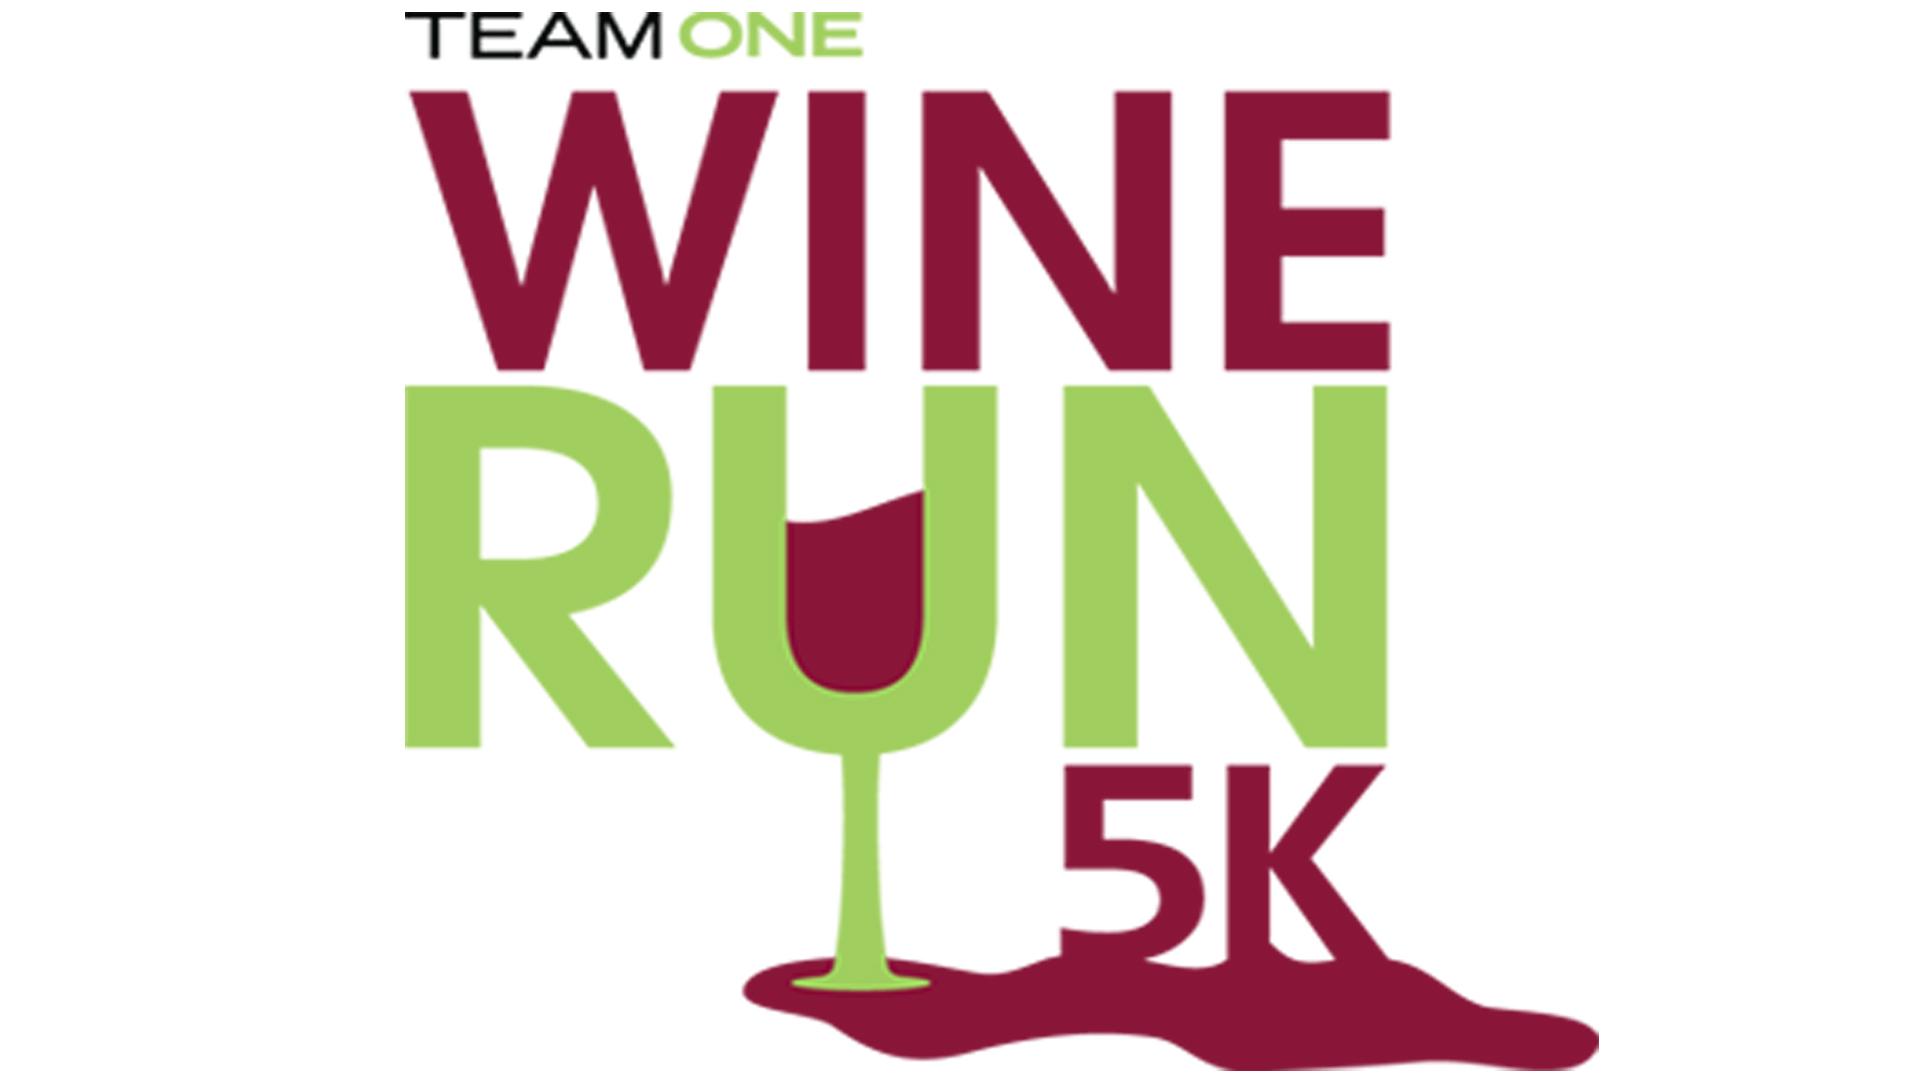 Team One Wine Run 5k Dow Event Center